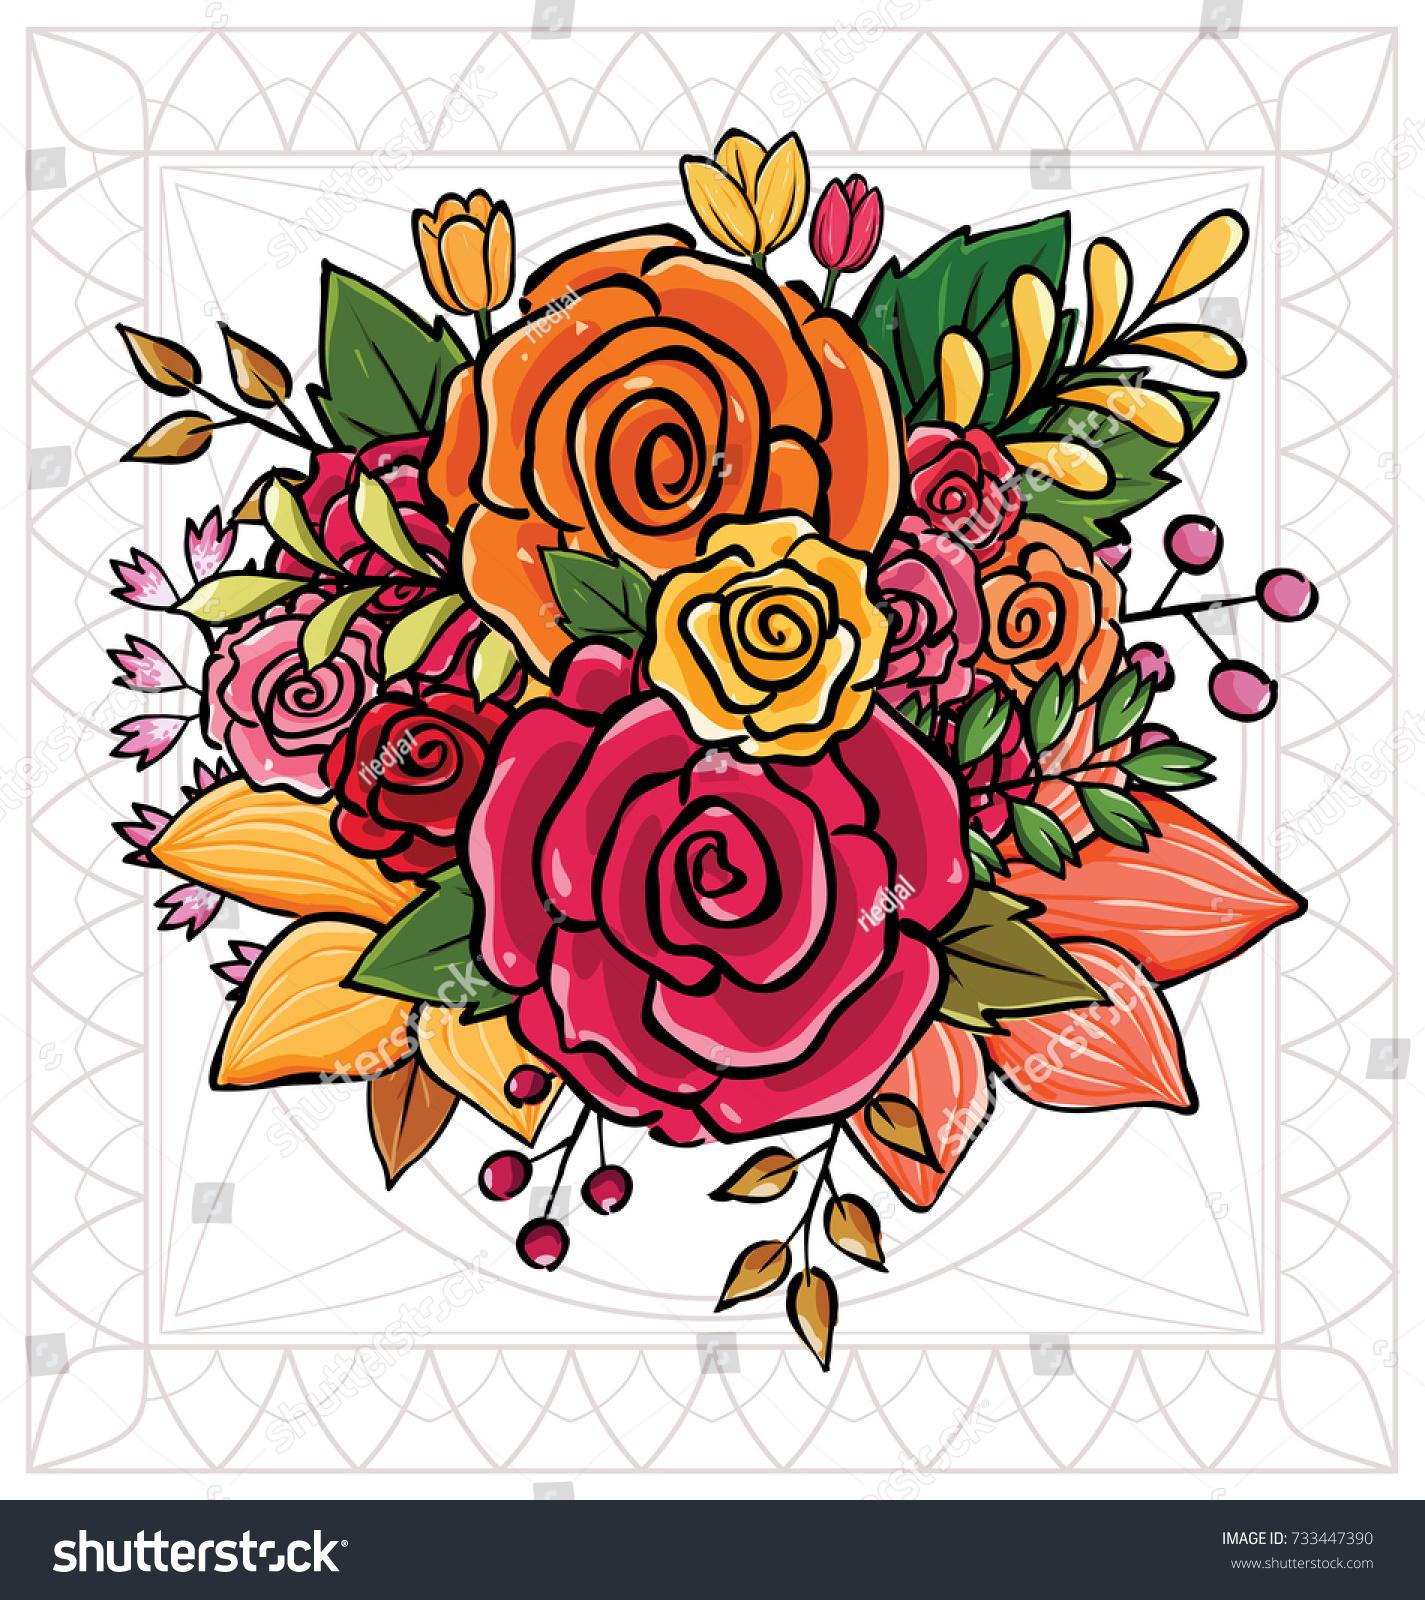 Flower Bouquet Vector Illustration Stock Vector 733447390 Shutterstock